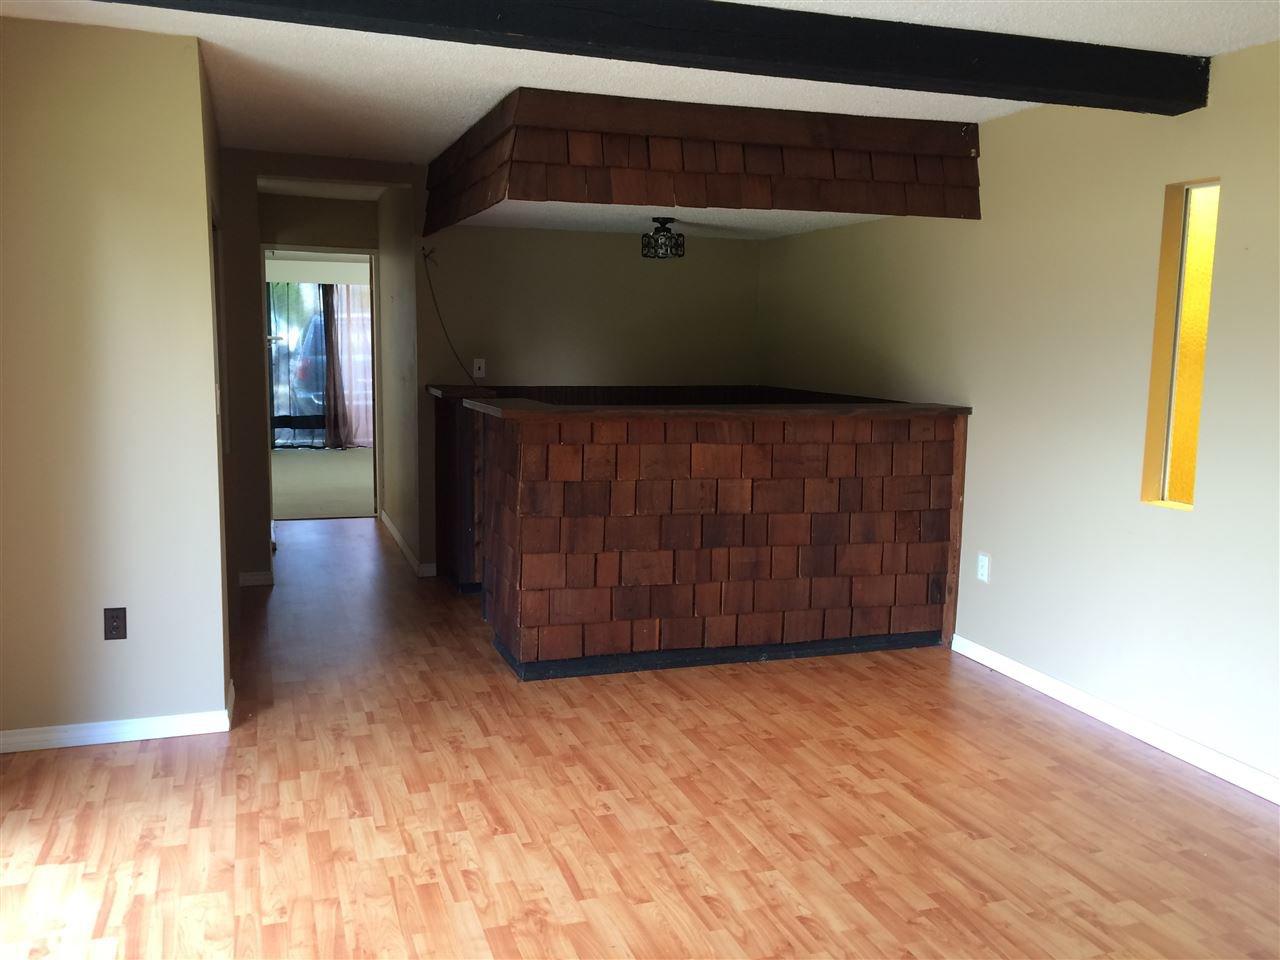 Photo 6: Photos: 12361 BONSON Road in Pitt Meadows: Mid Meadows House for sale : MLS®# R2078094